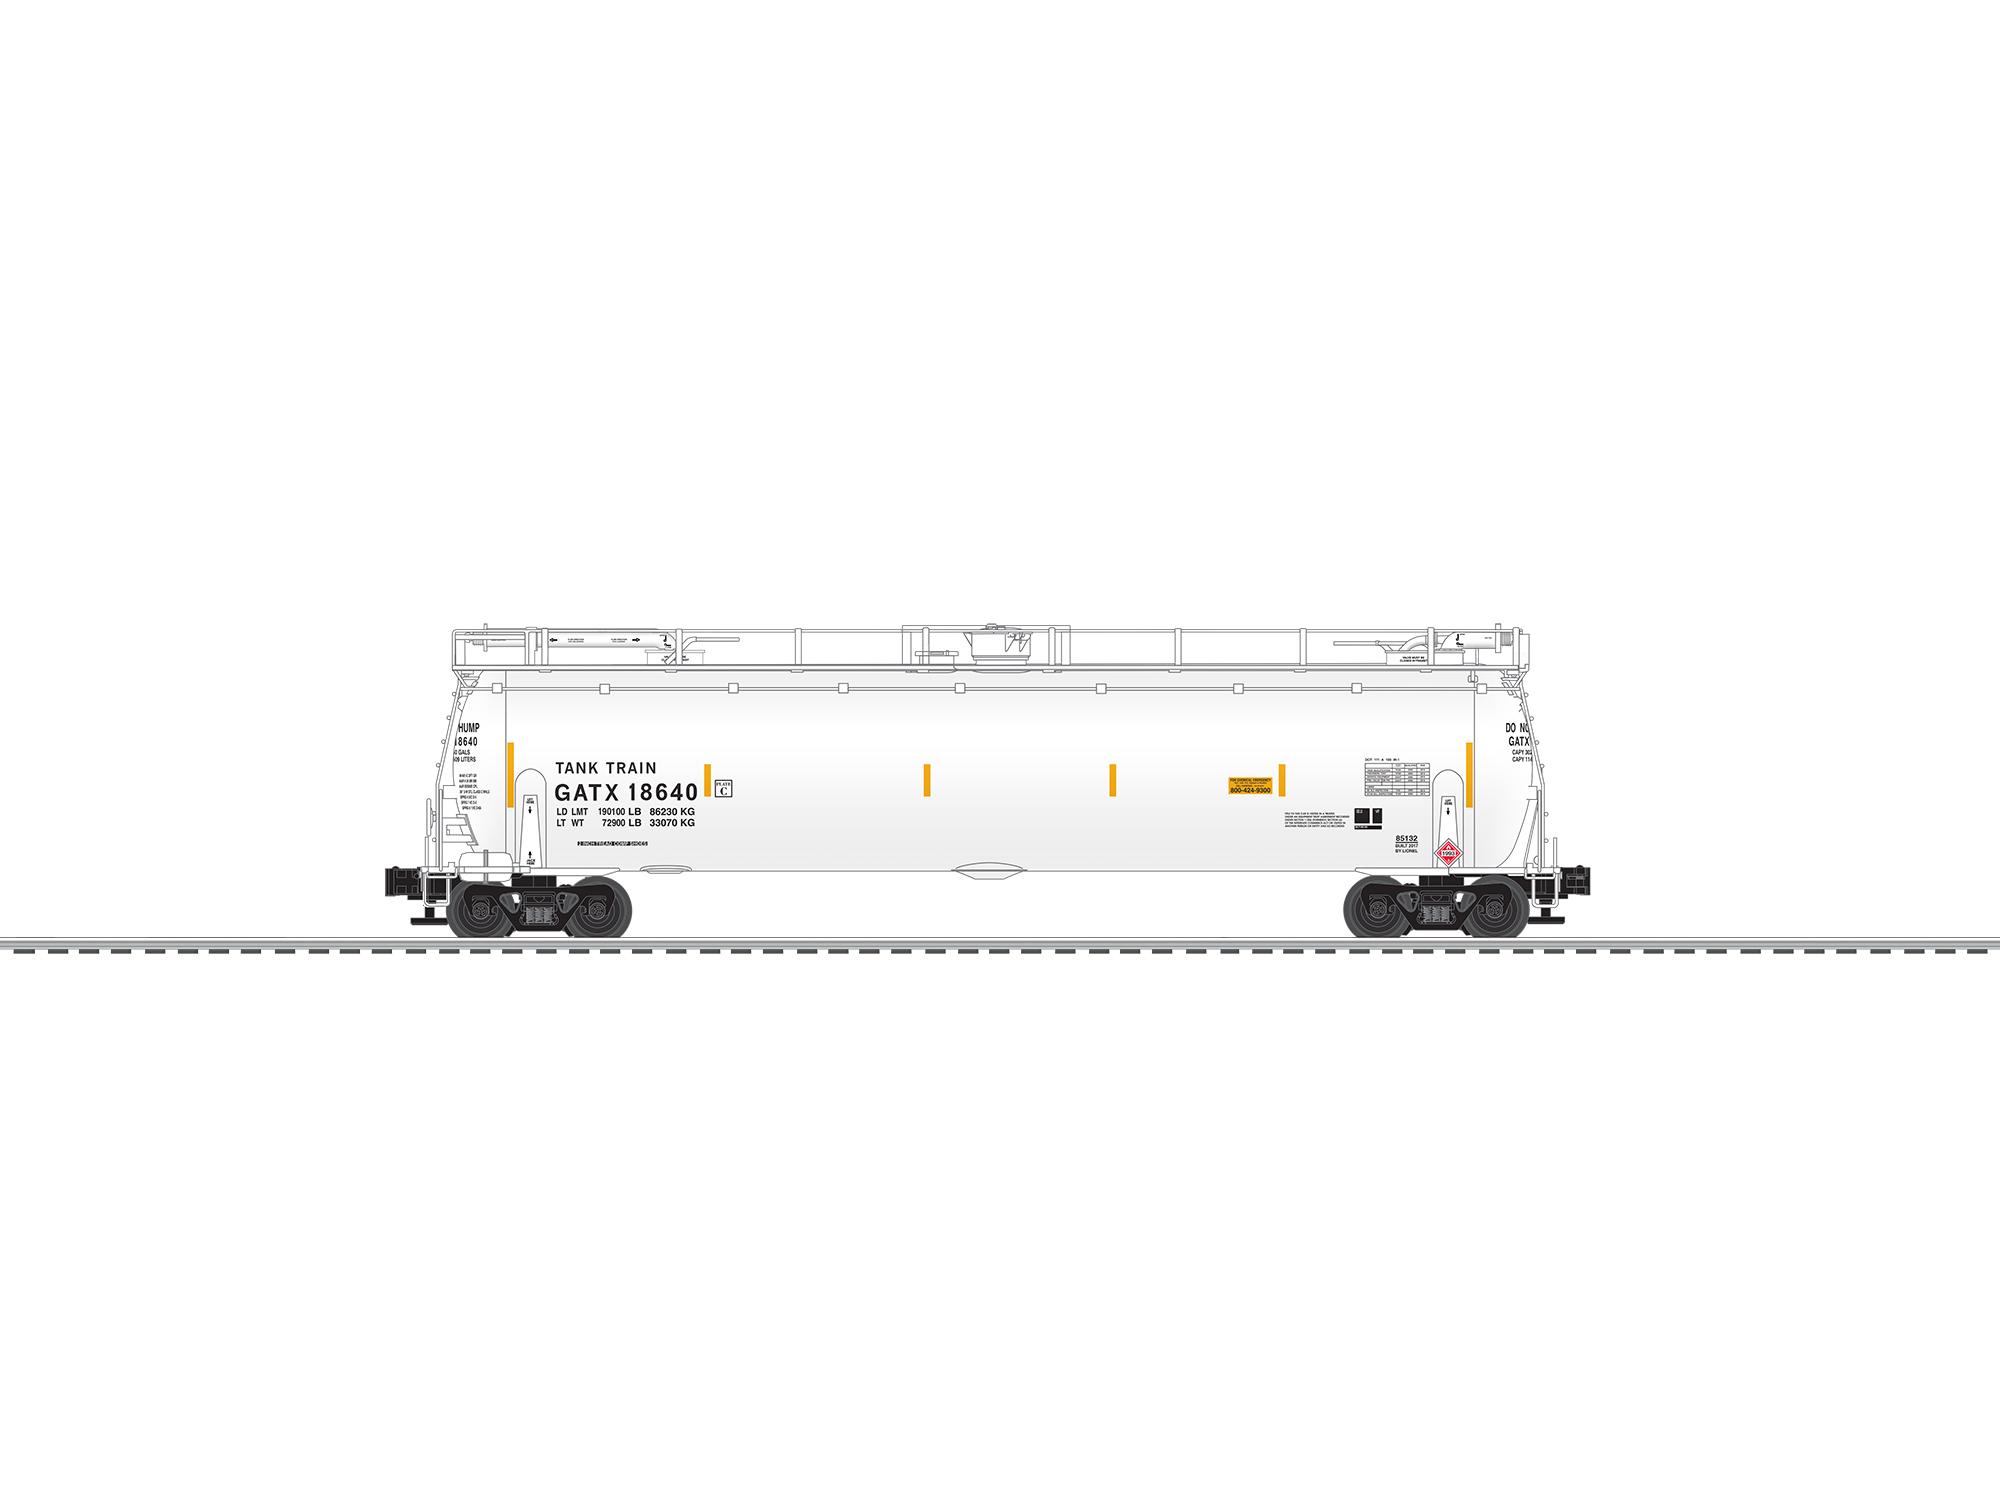 LNL685108 Lionel O TankTrain w/EOT, White (2)